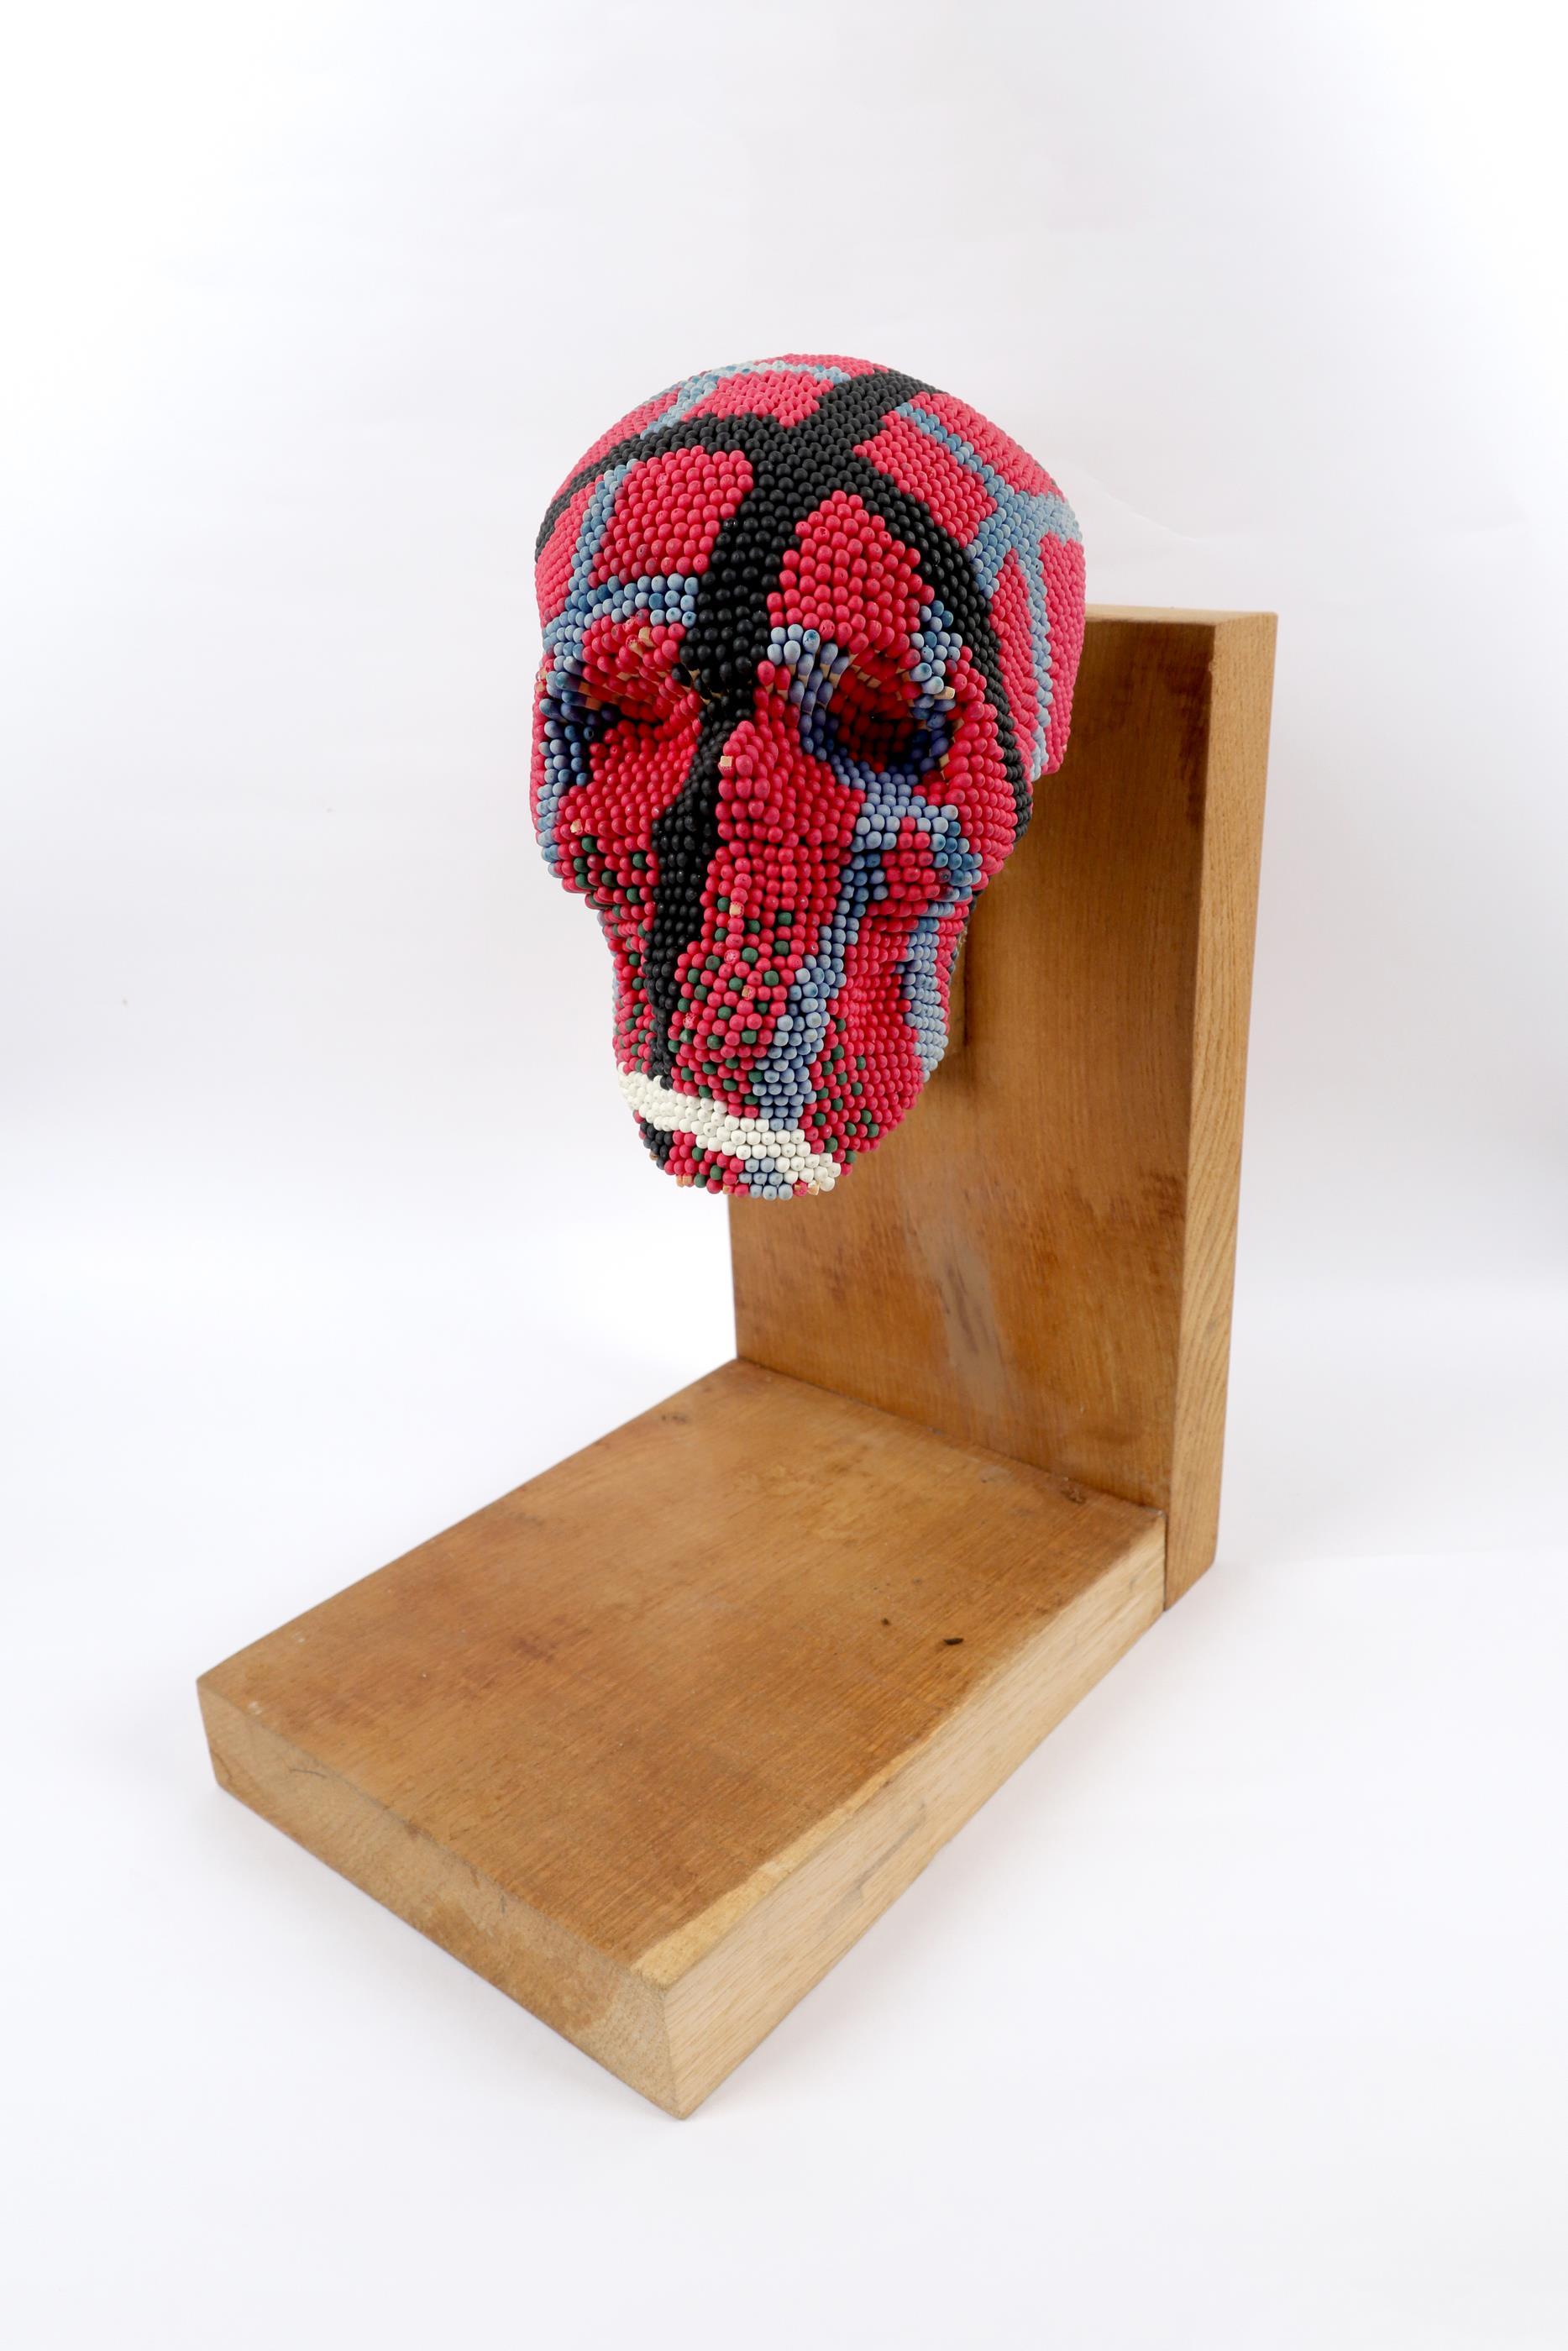 ‡David Mach RA (Scottish b.1956) Skull Signed Mach 98/No. 10/12 (to label underneath chin)